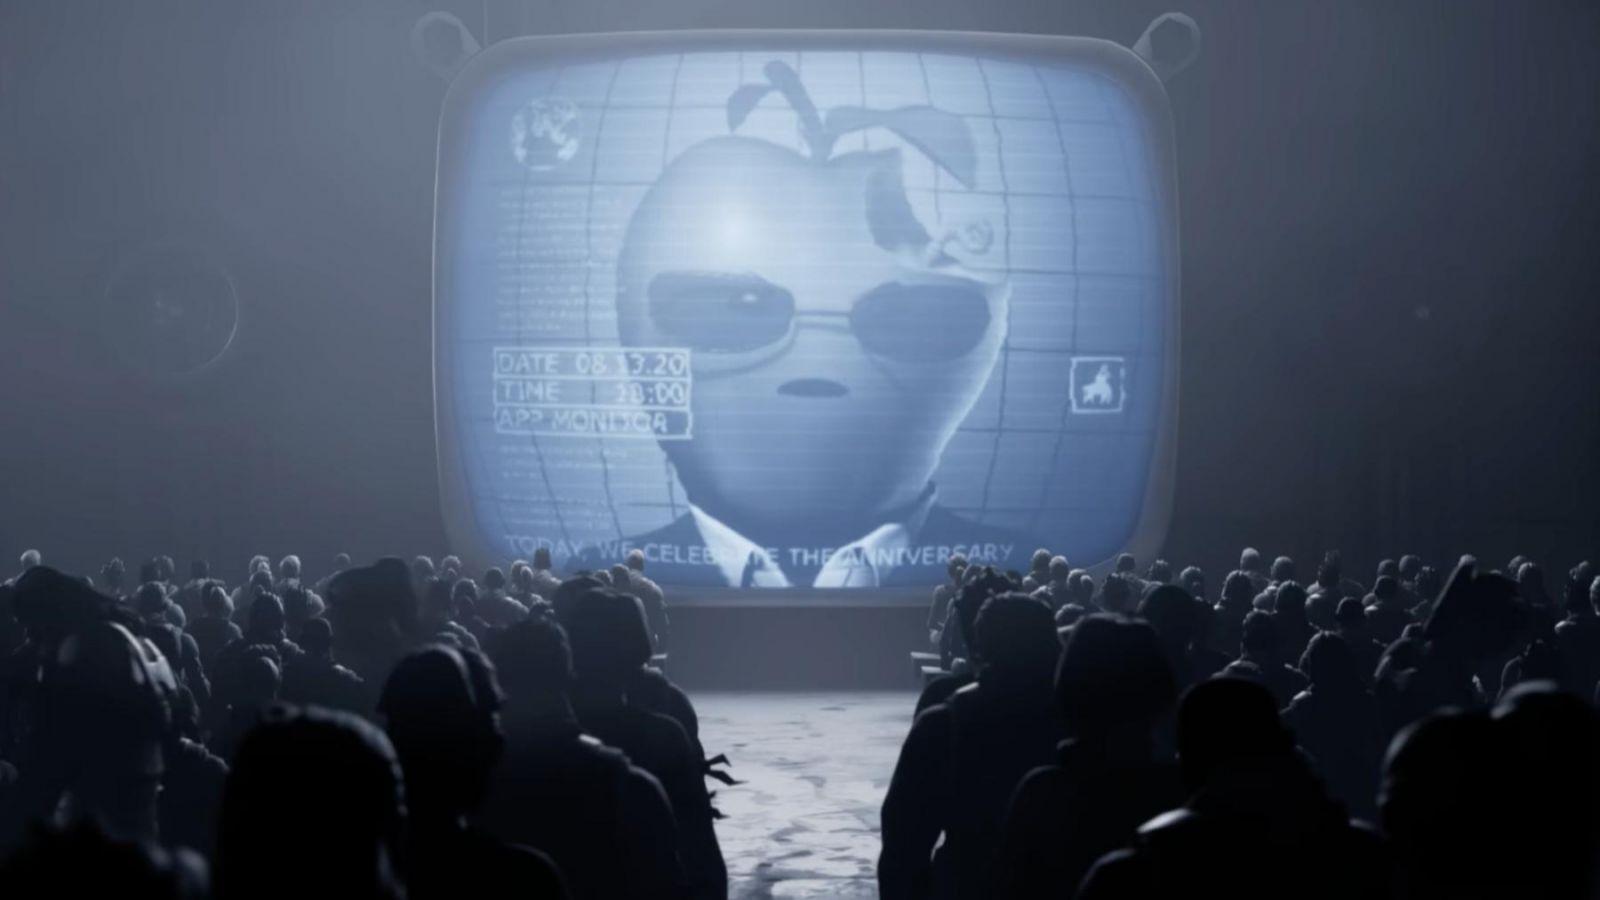 Epic Games и Apple столкнутся в суде в мае 2021 года (f3c77234bf3d4a228da7a6887e3df31e)